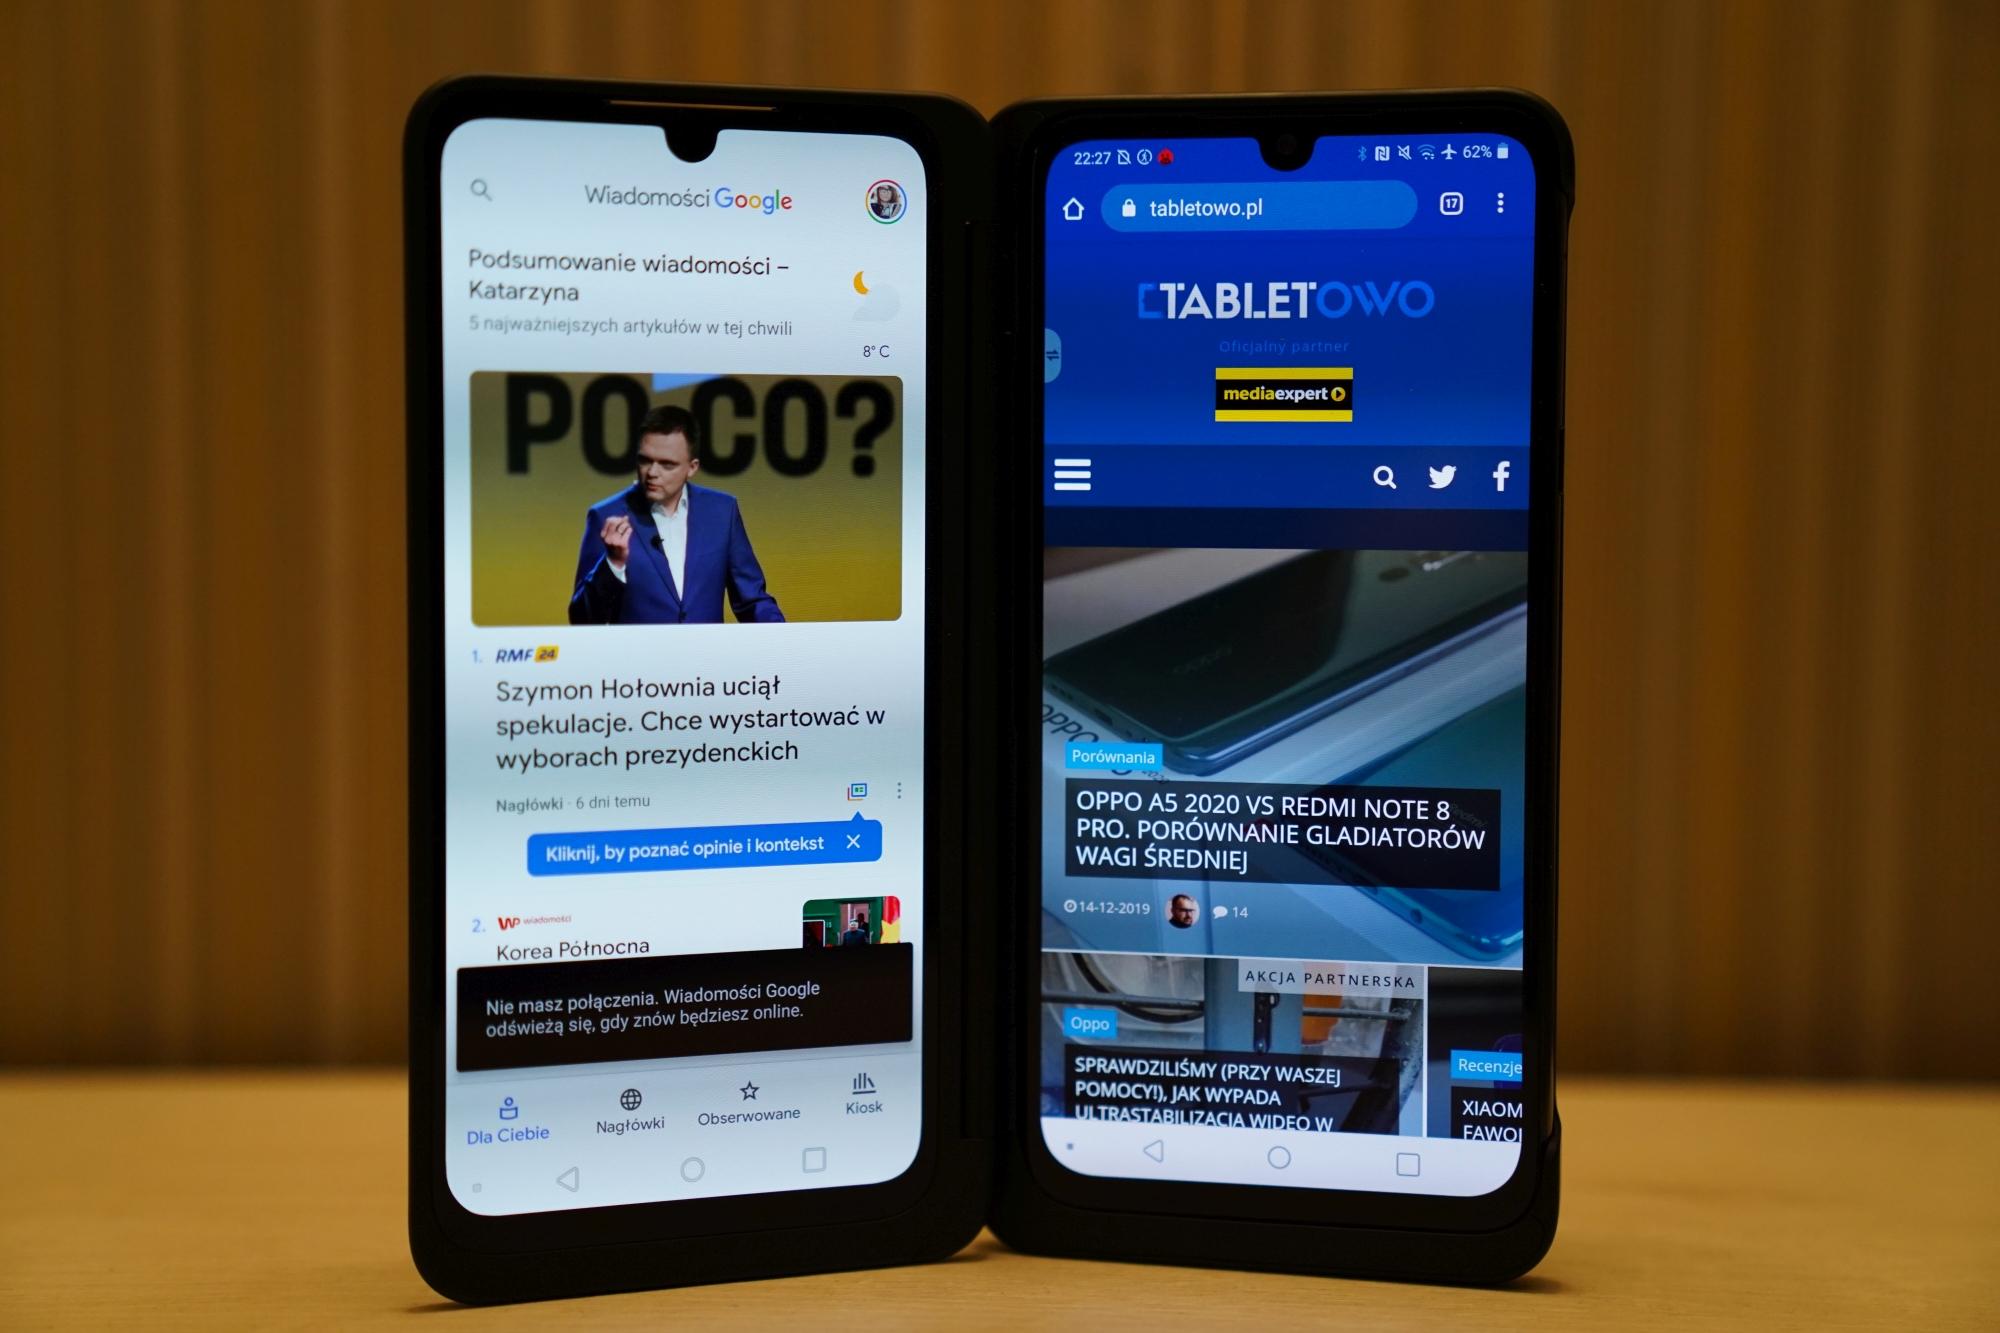 smartfon LG G8x ThinQ LG Dual Screen